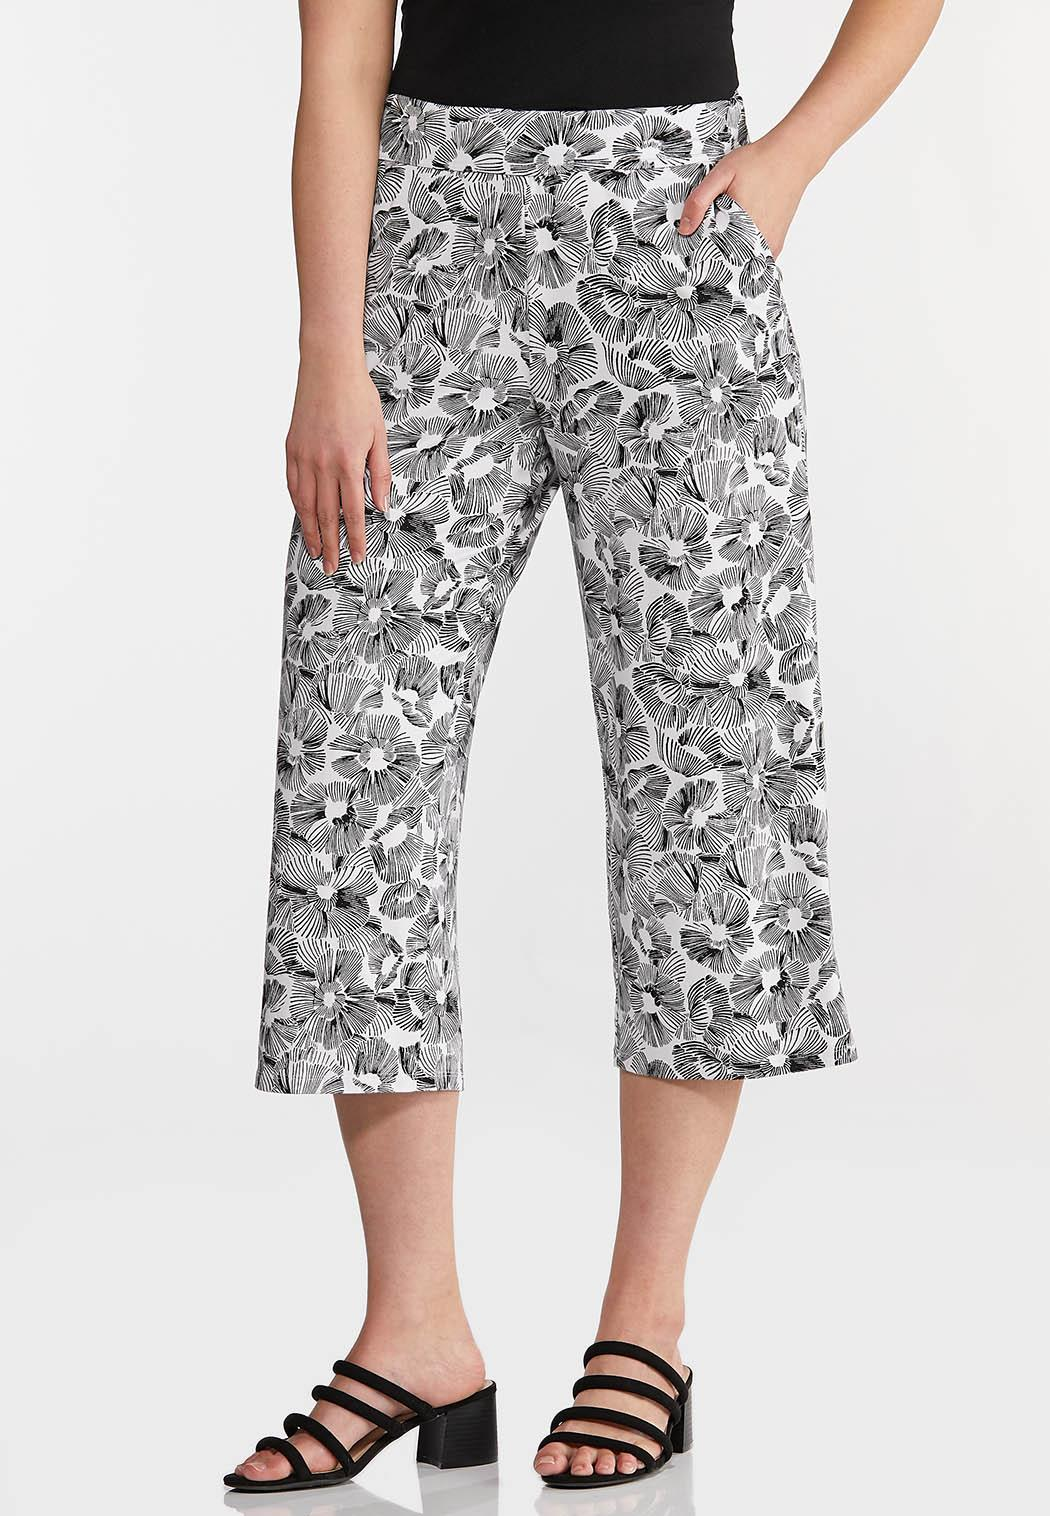 Cropped Sketch Floral Pants